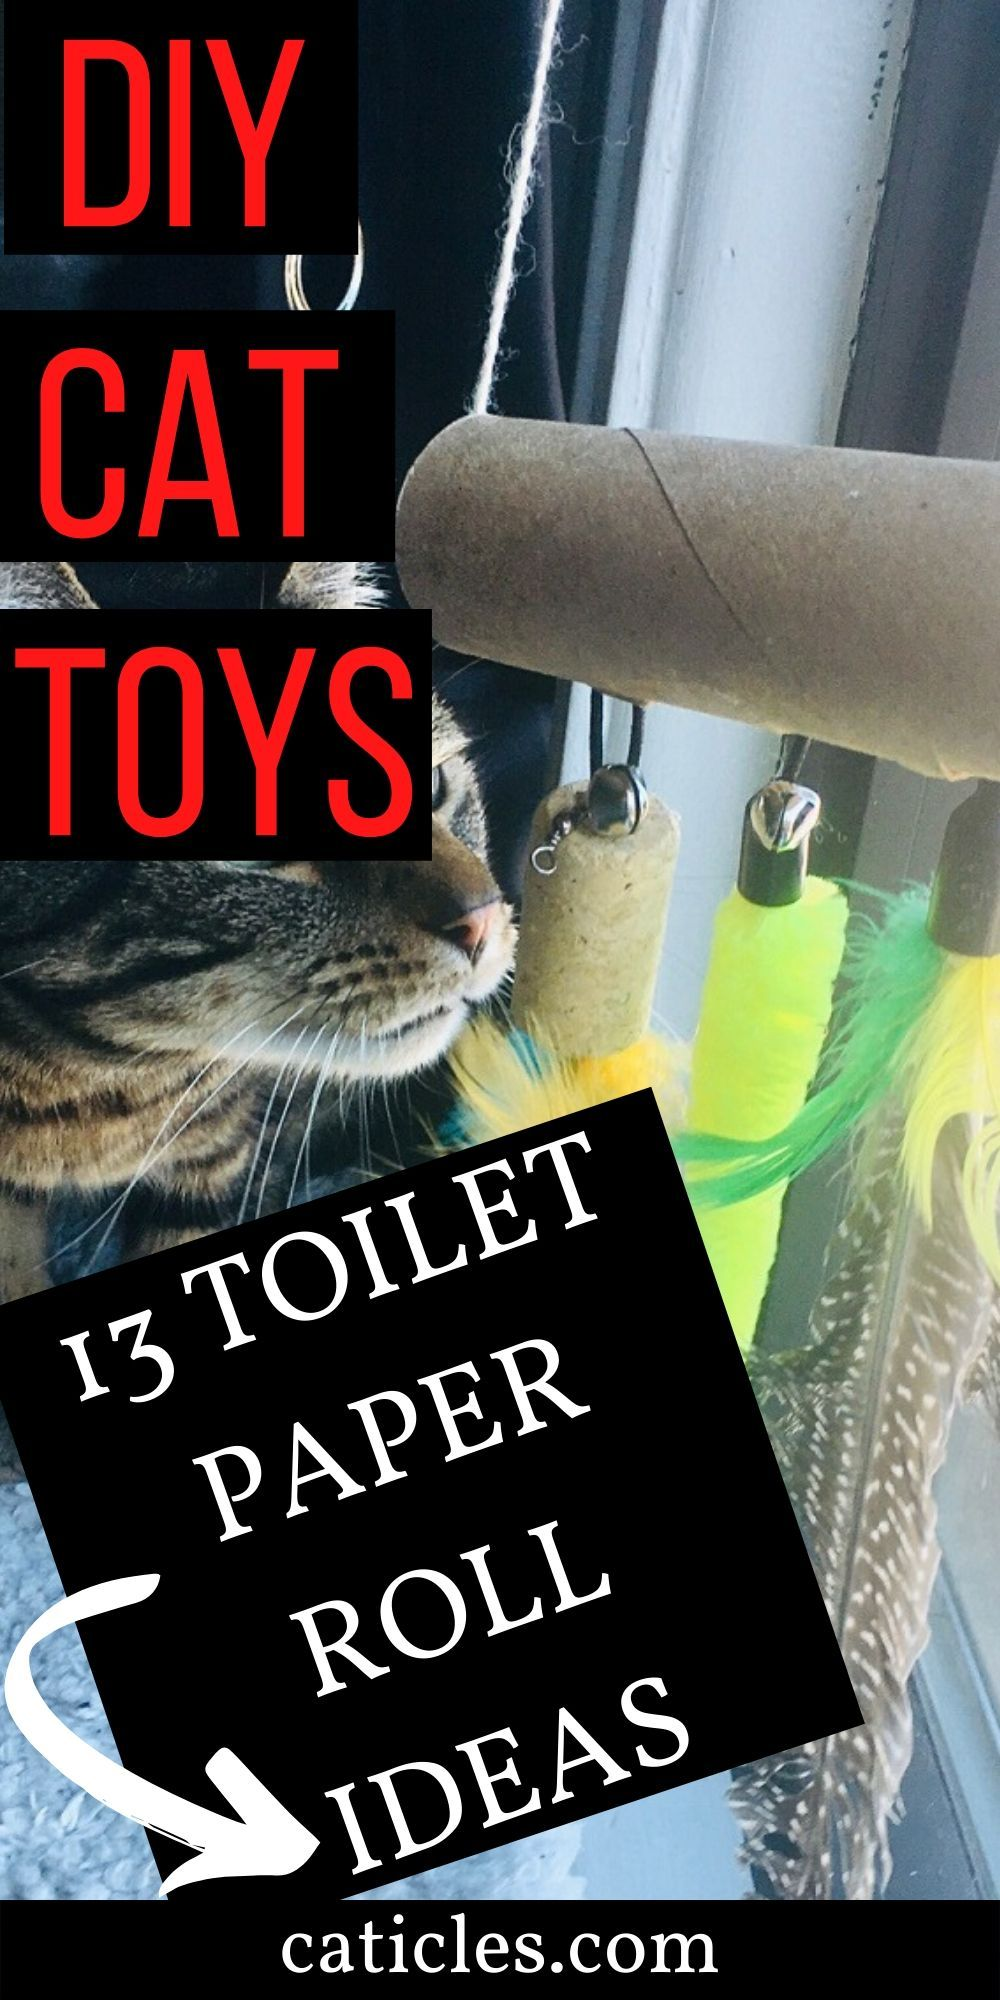 diy dog toys for shelters